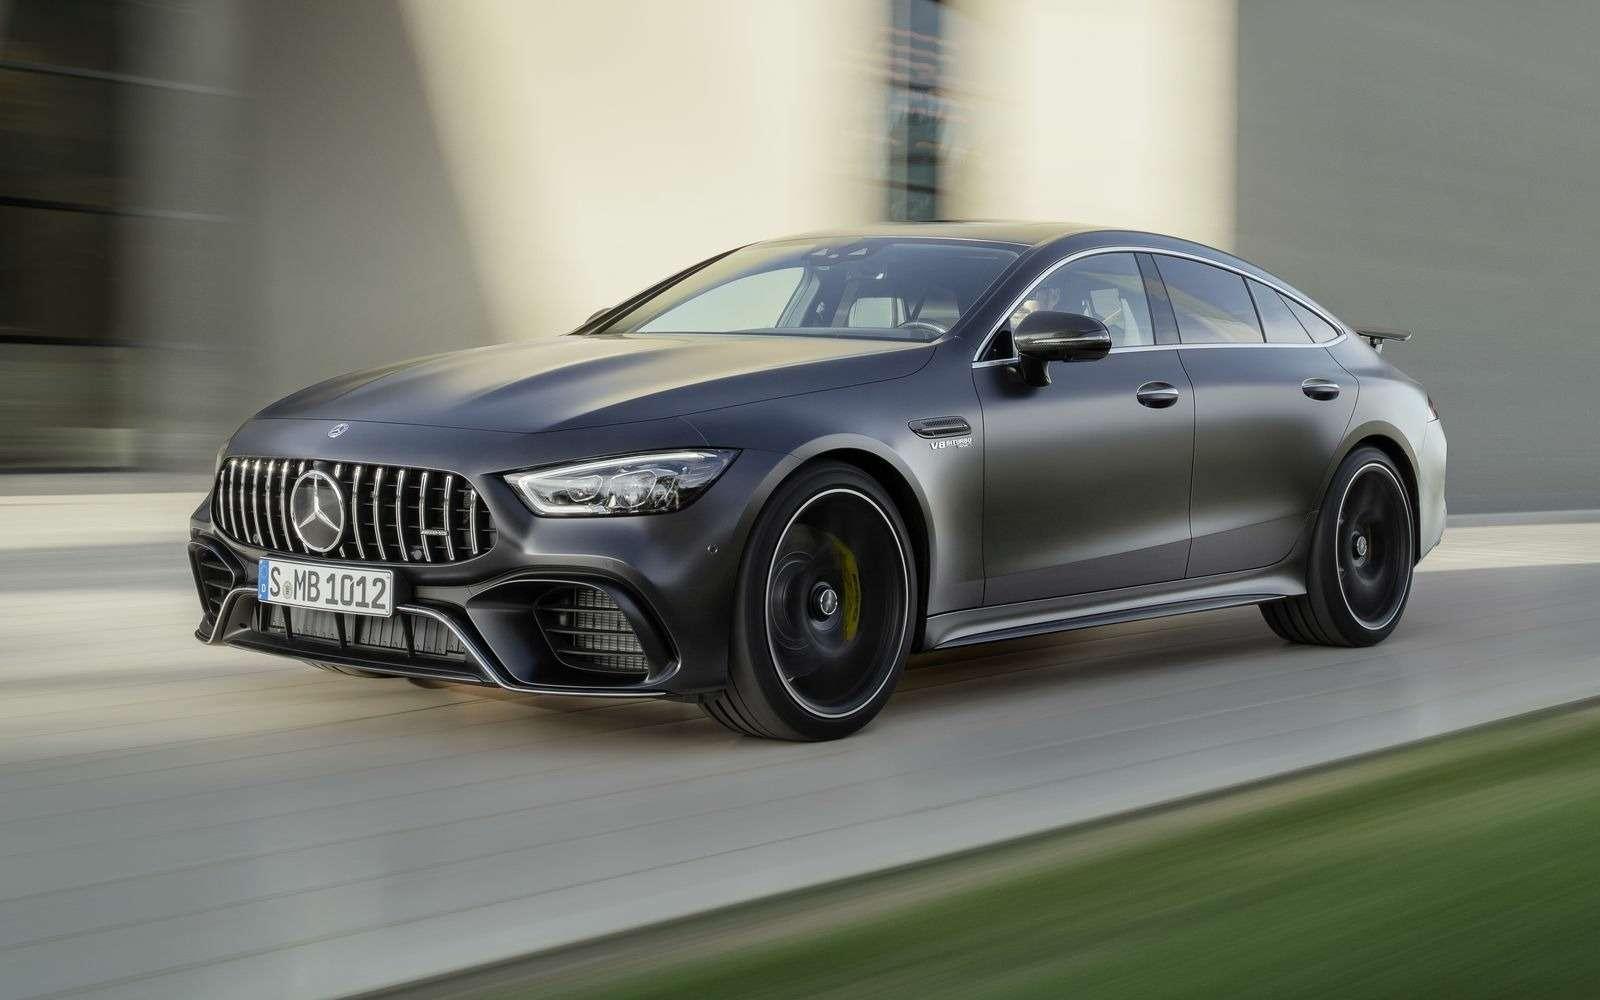 Подмена! Пятидверный Mercedes-AMG GTполучил «тележку» Е-класса— фото 851529